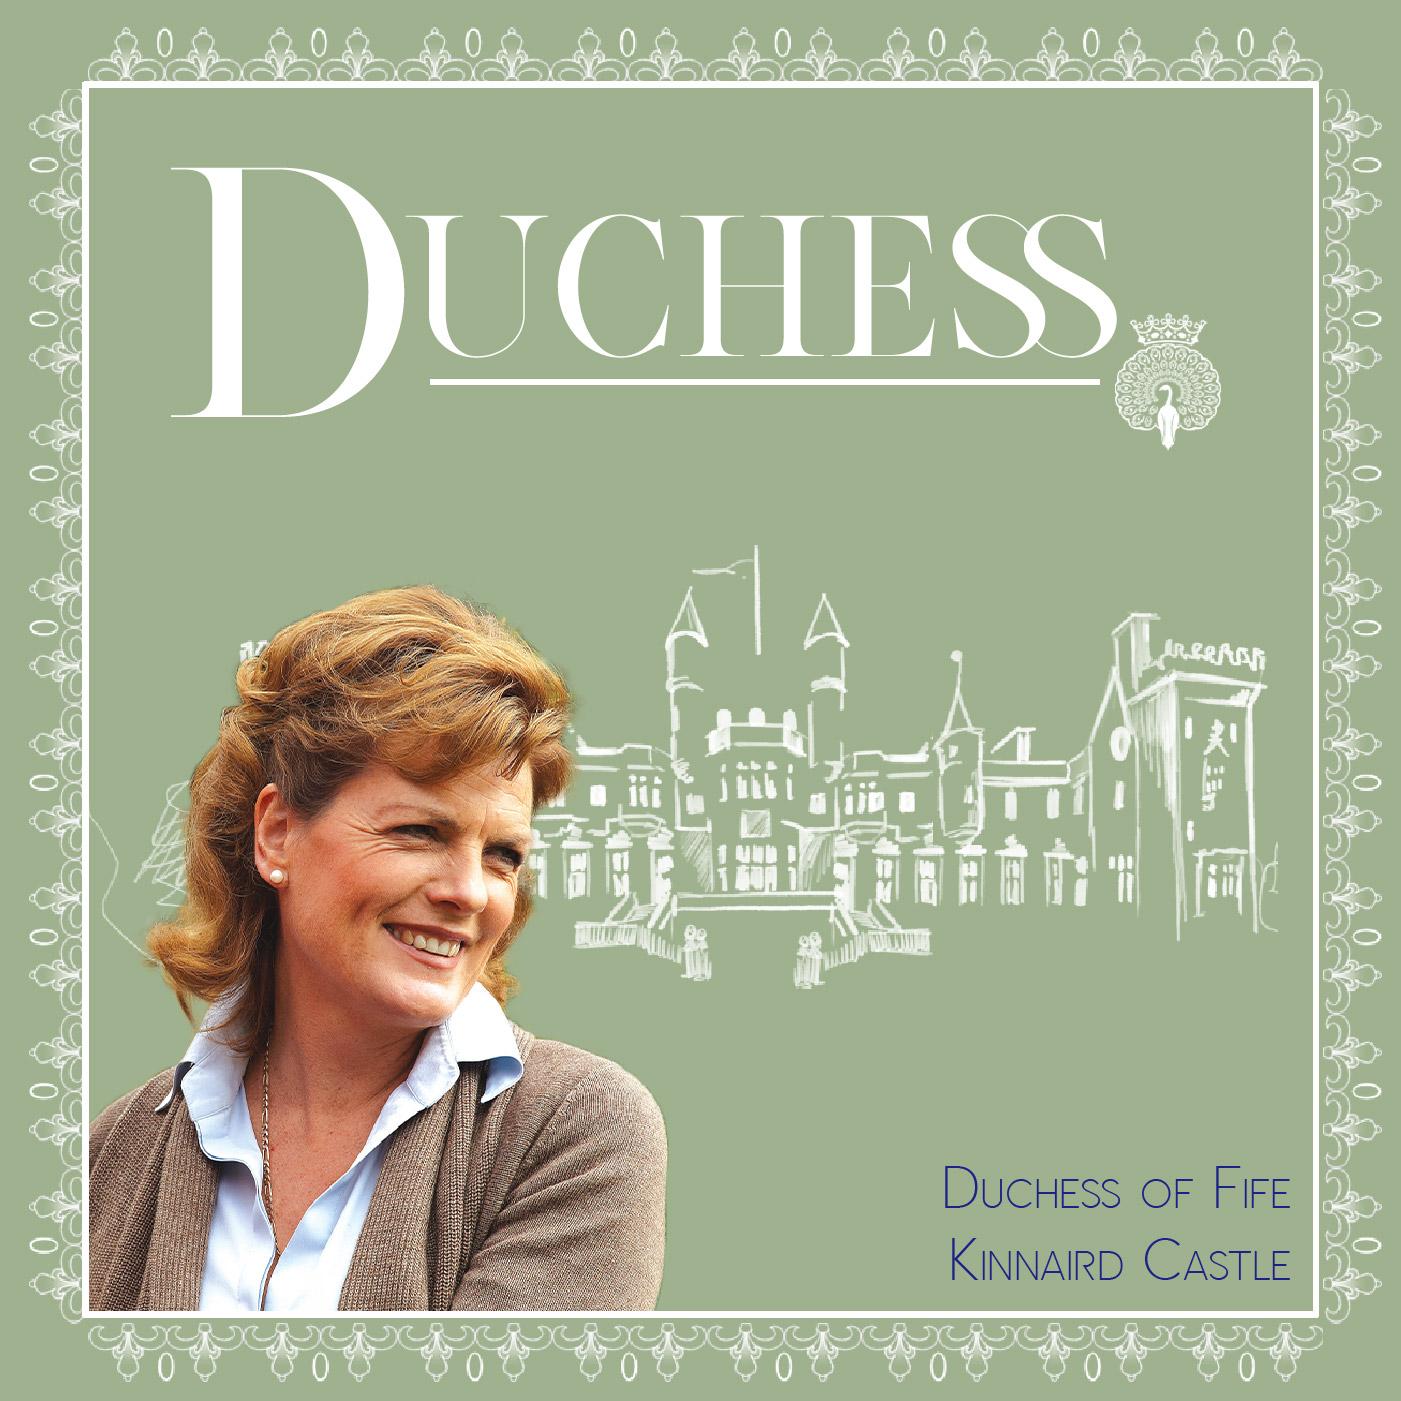 The Duchess of Fife at Kinnaird Castle